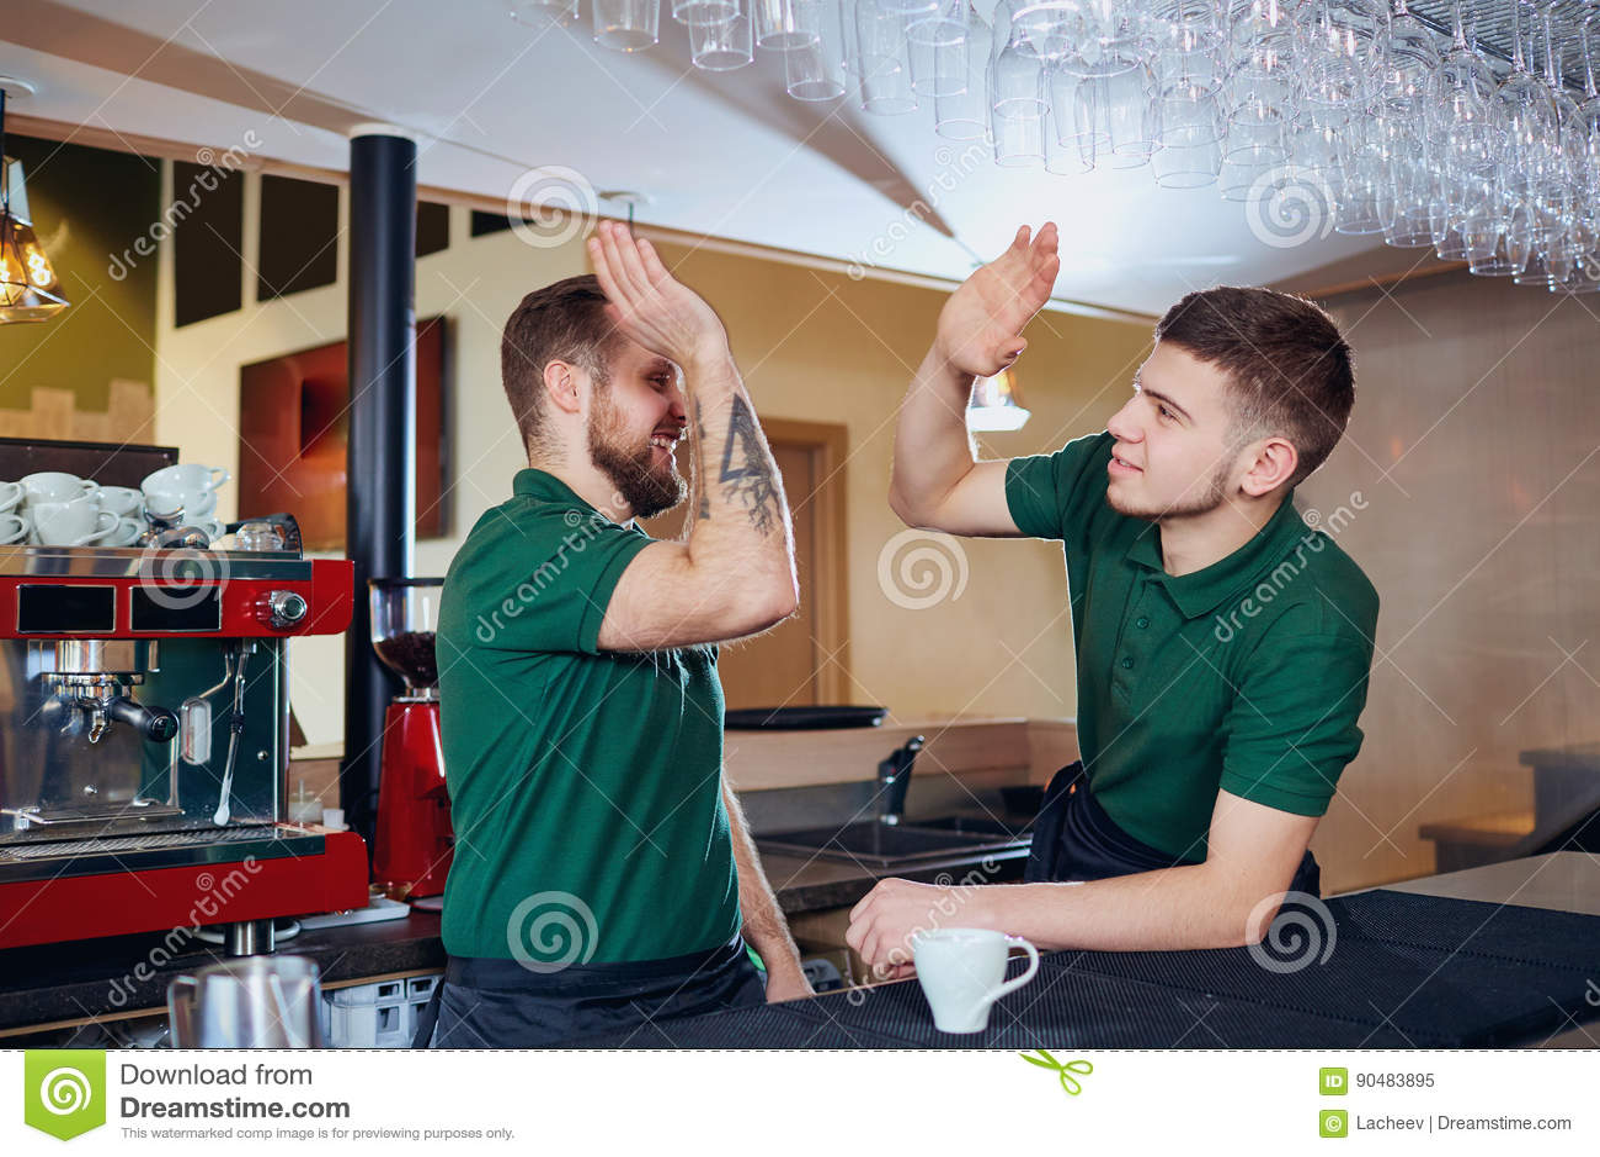 The barista barman team is a waiter at the bar restaurant cafe.